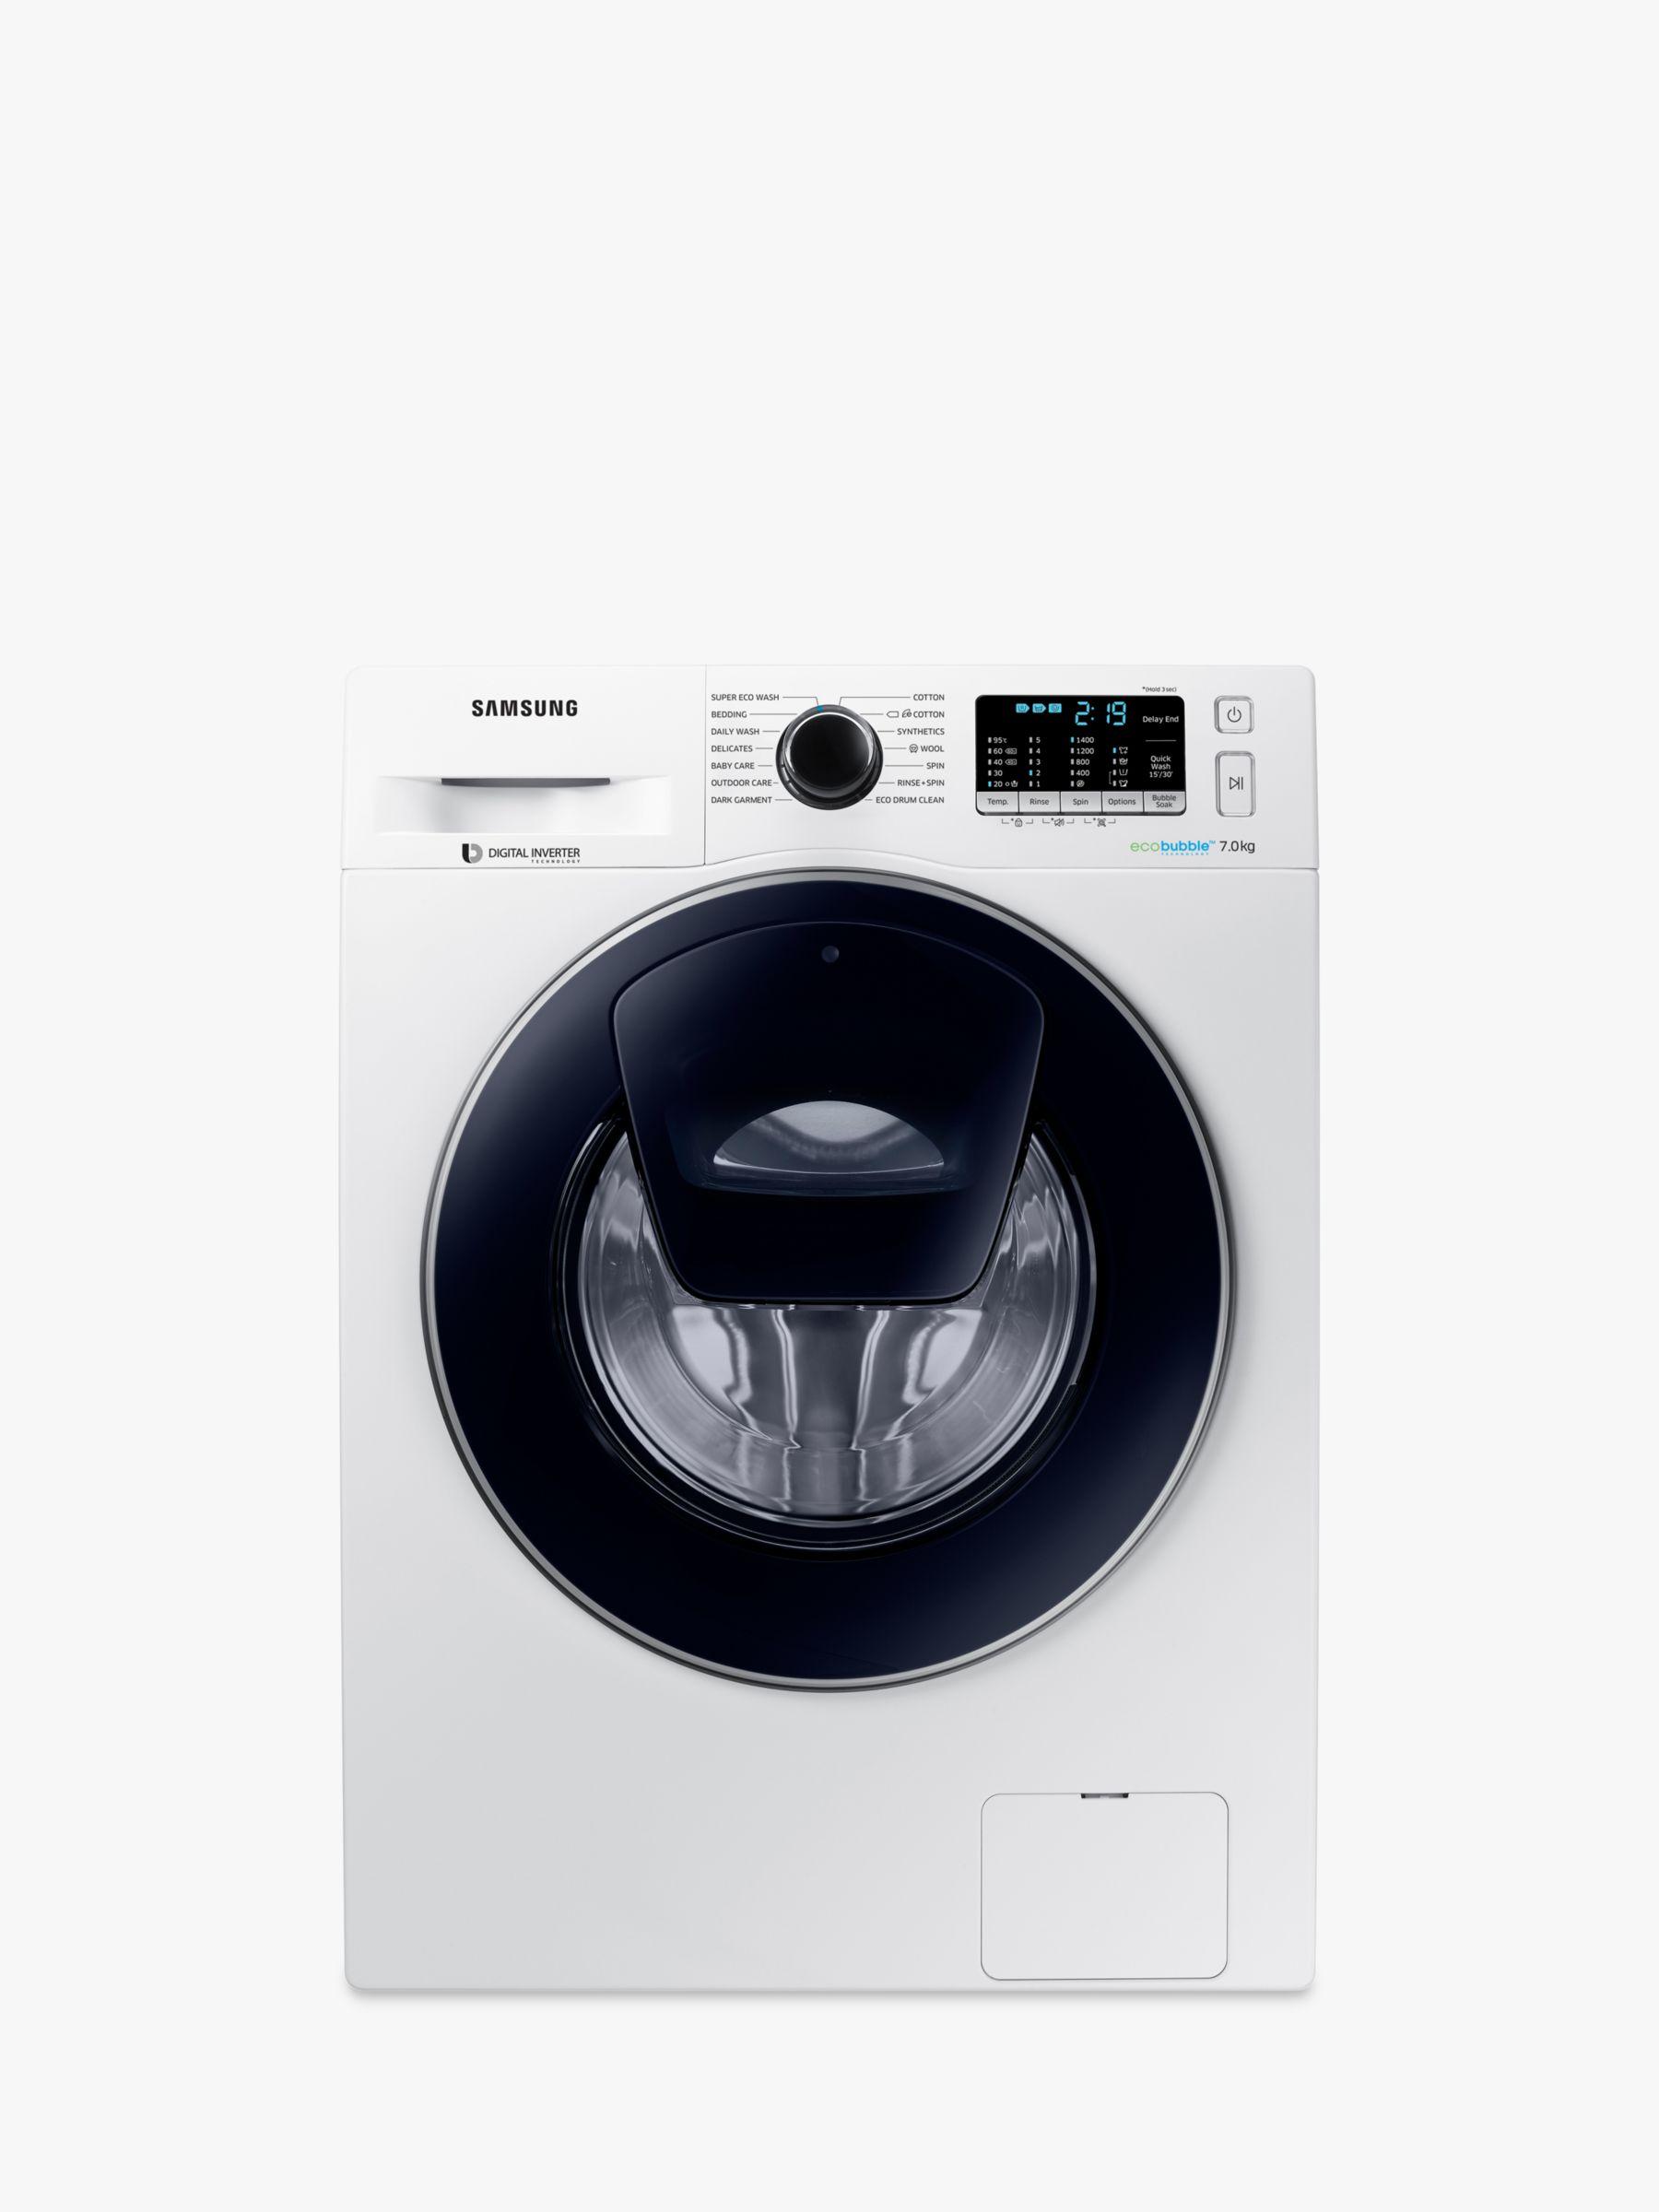 Samsung Samsung AddWash WW70K5410UW Washing Machine, 7kg Load, A+++ Energy Rating, 1400rpm Spin, White